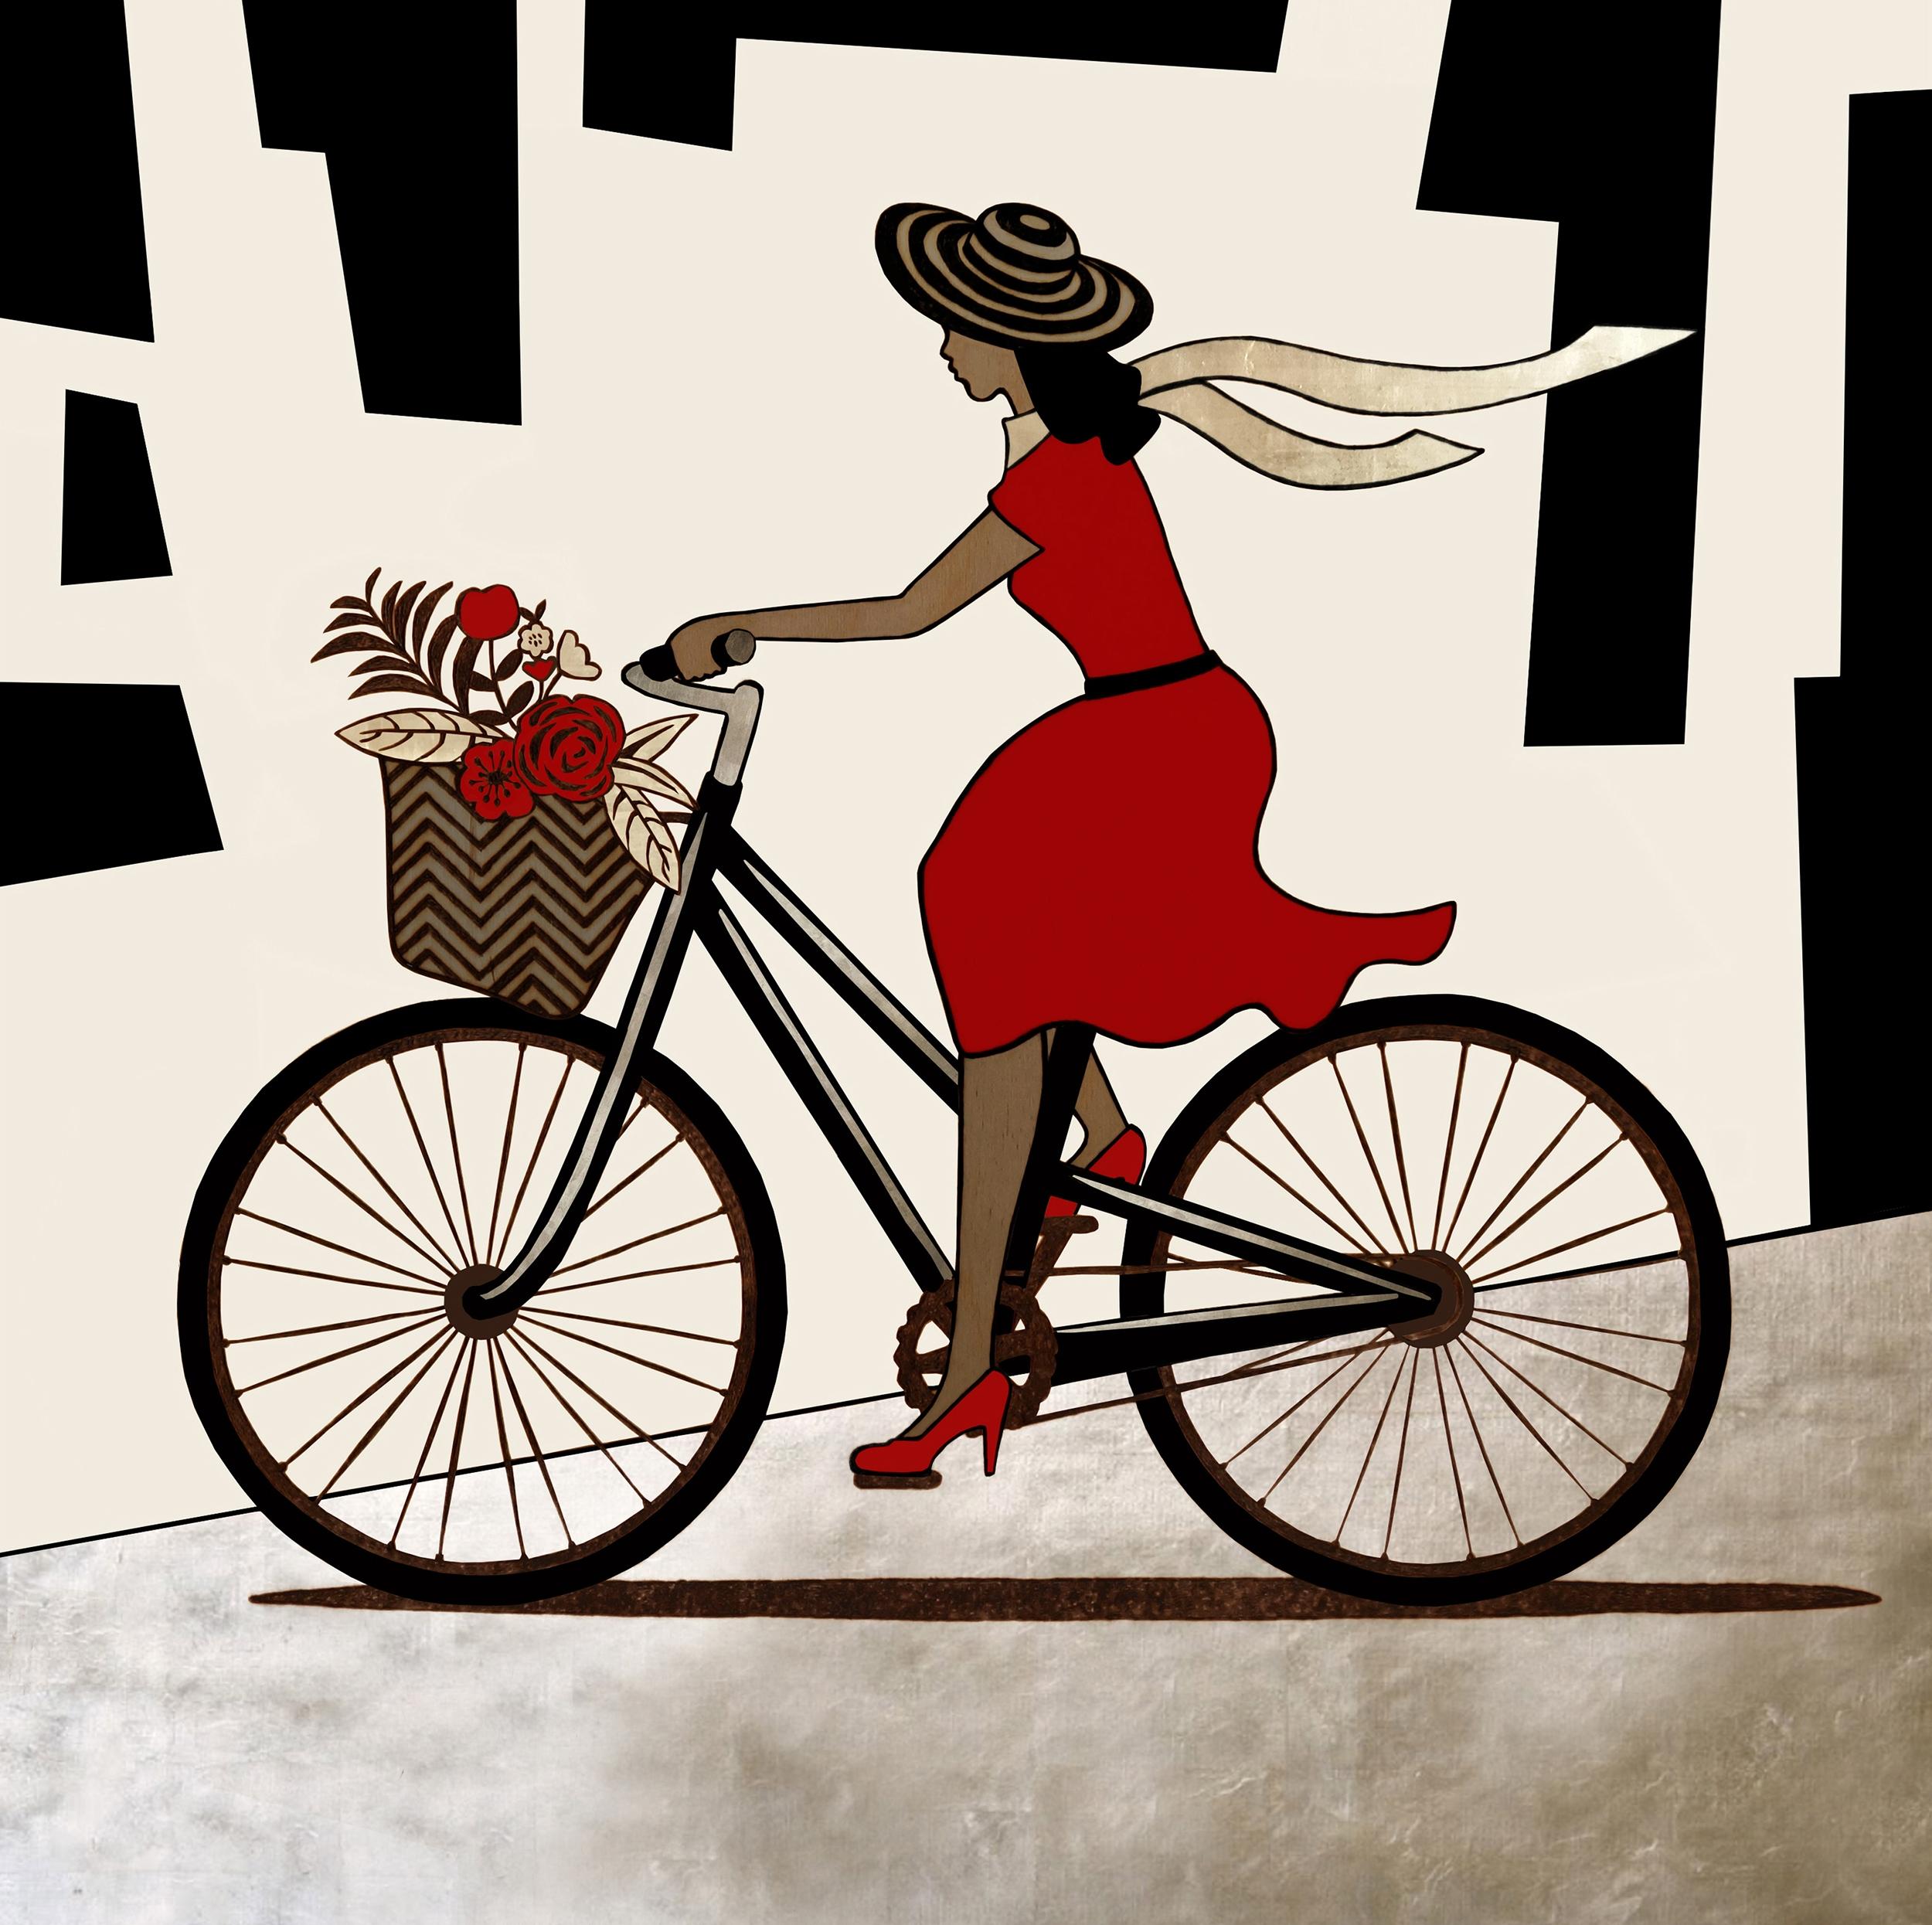 Samanta_Tello_Fancy_Women_on_Bikes_scarf.jpg